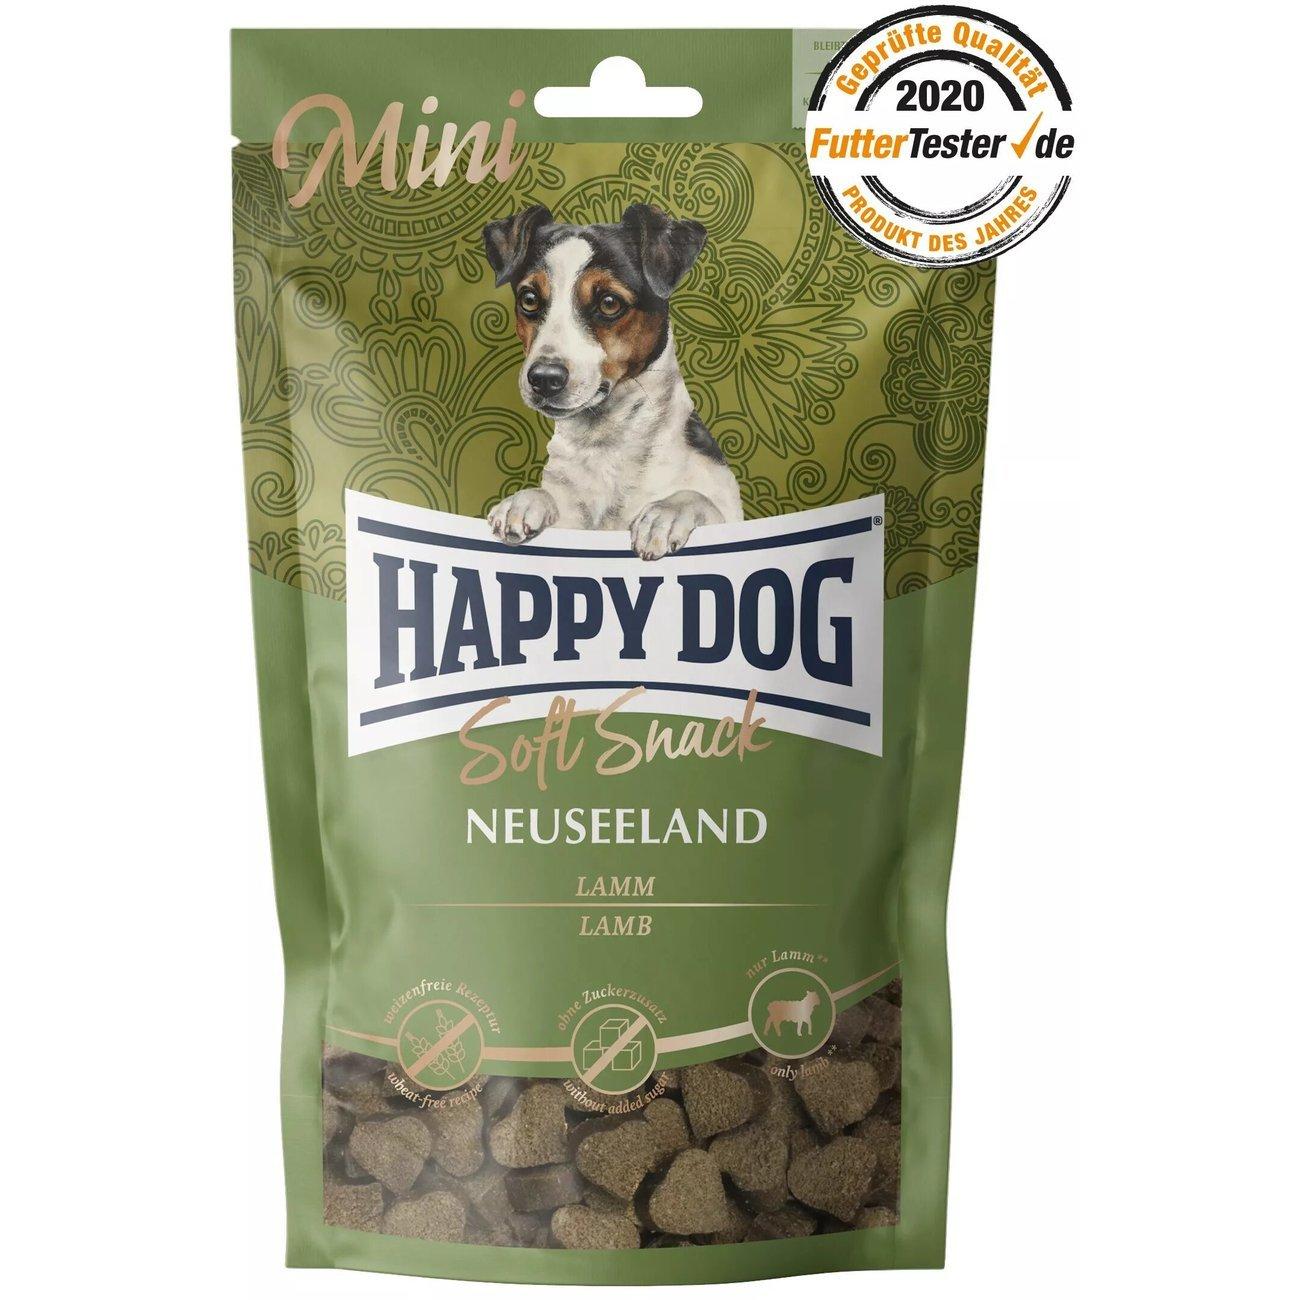 Happy Dog Soft Snack Supreme Neuseeland Lamm Reis Mini, 100g